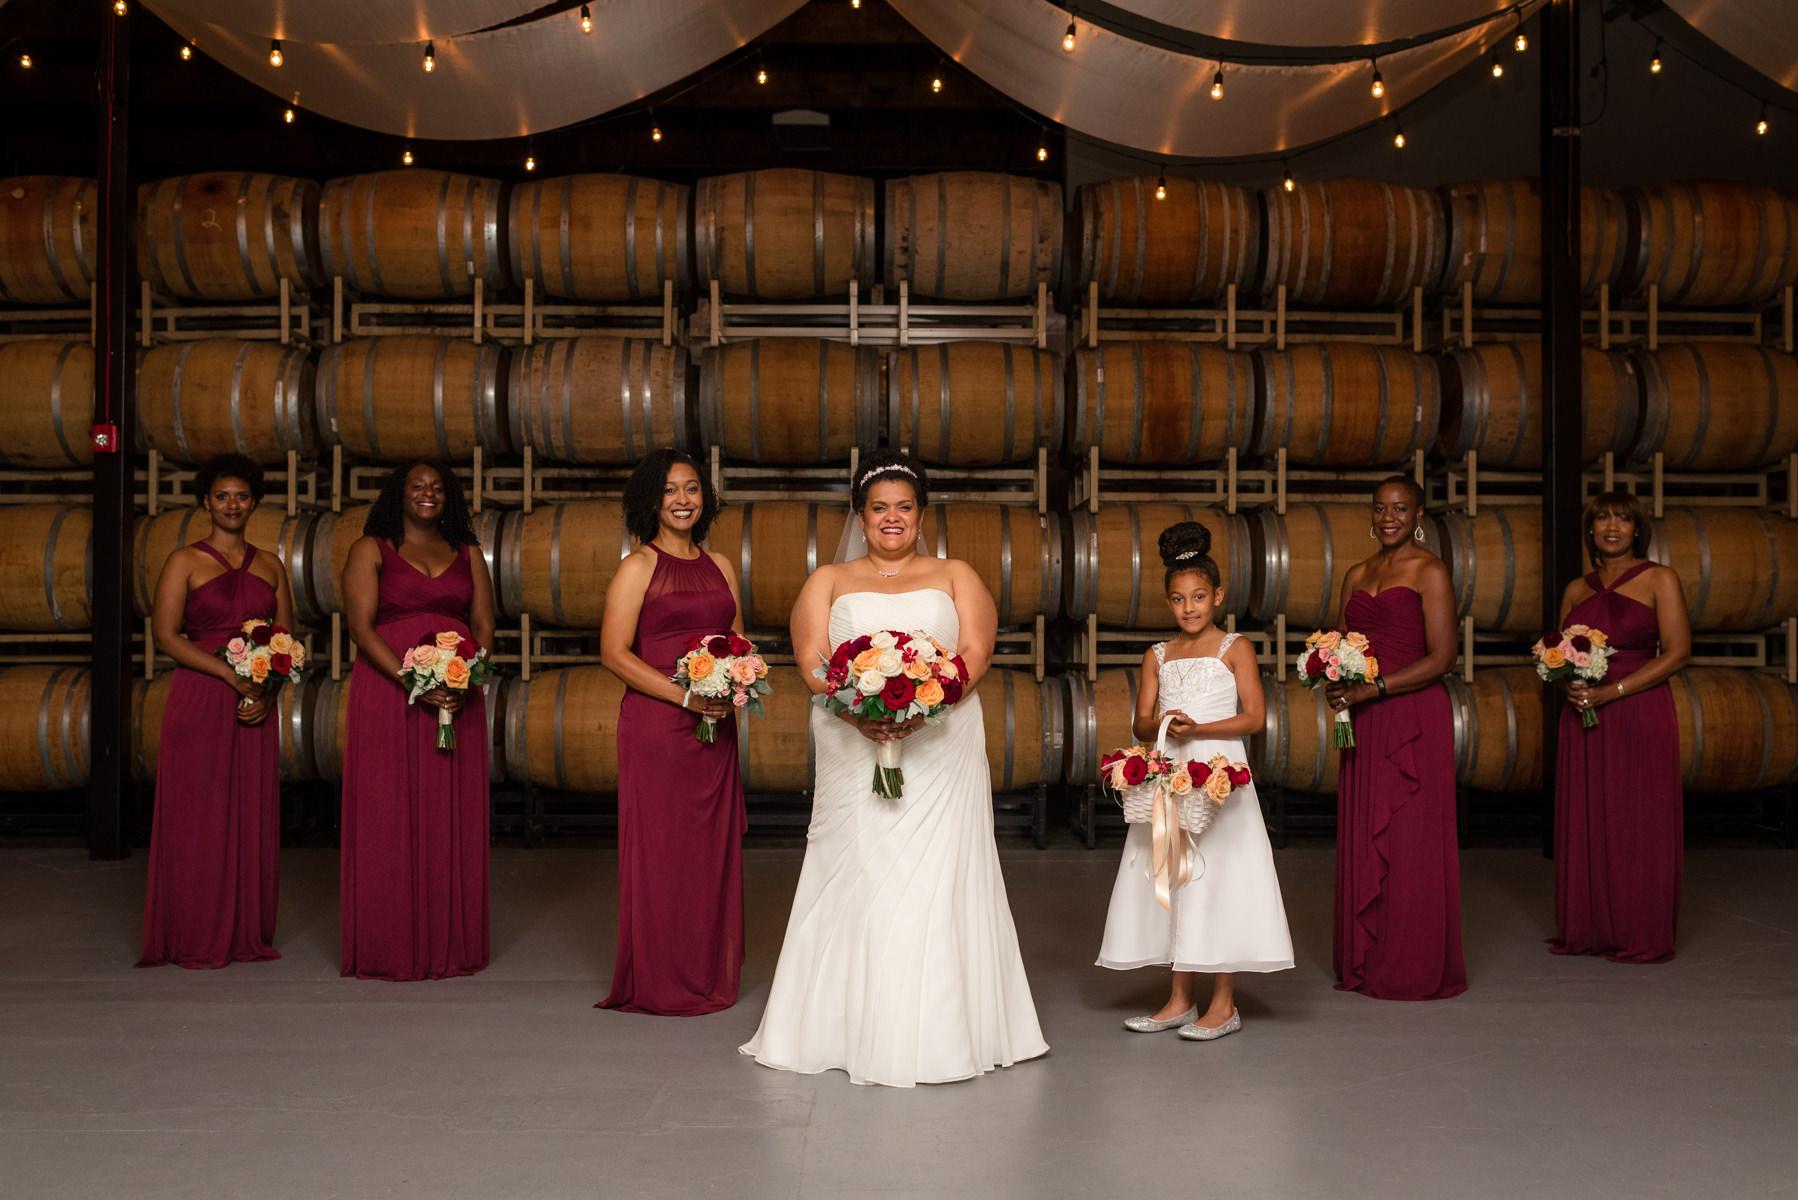 Andrew Tat - Documentary Wedding Photography - Columbia Winery - Woodinville, Washington -Patricia & Teffin - 05.jpg